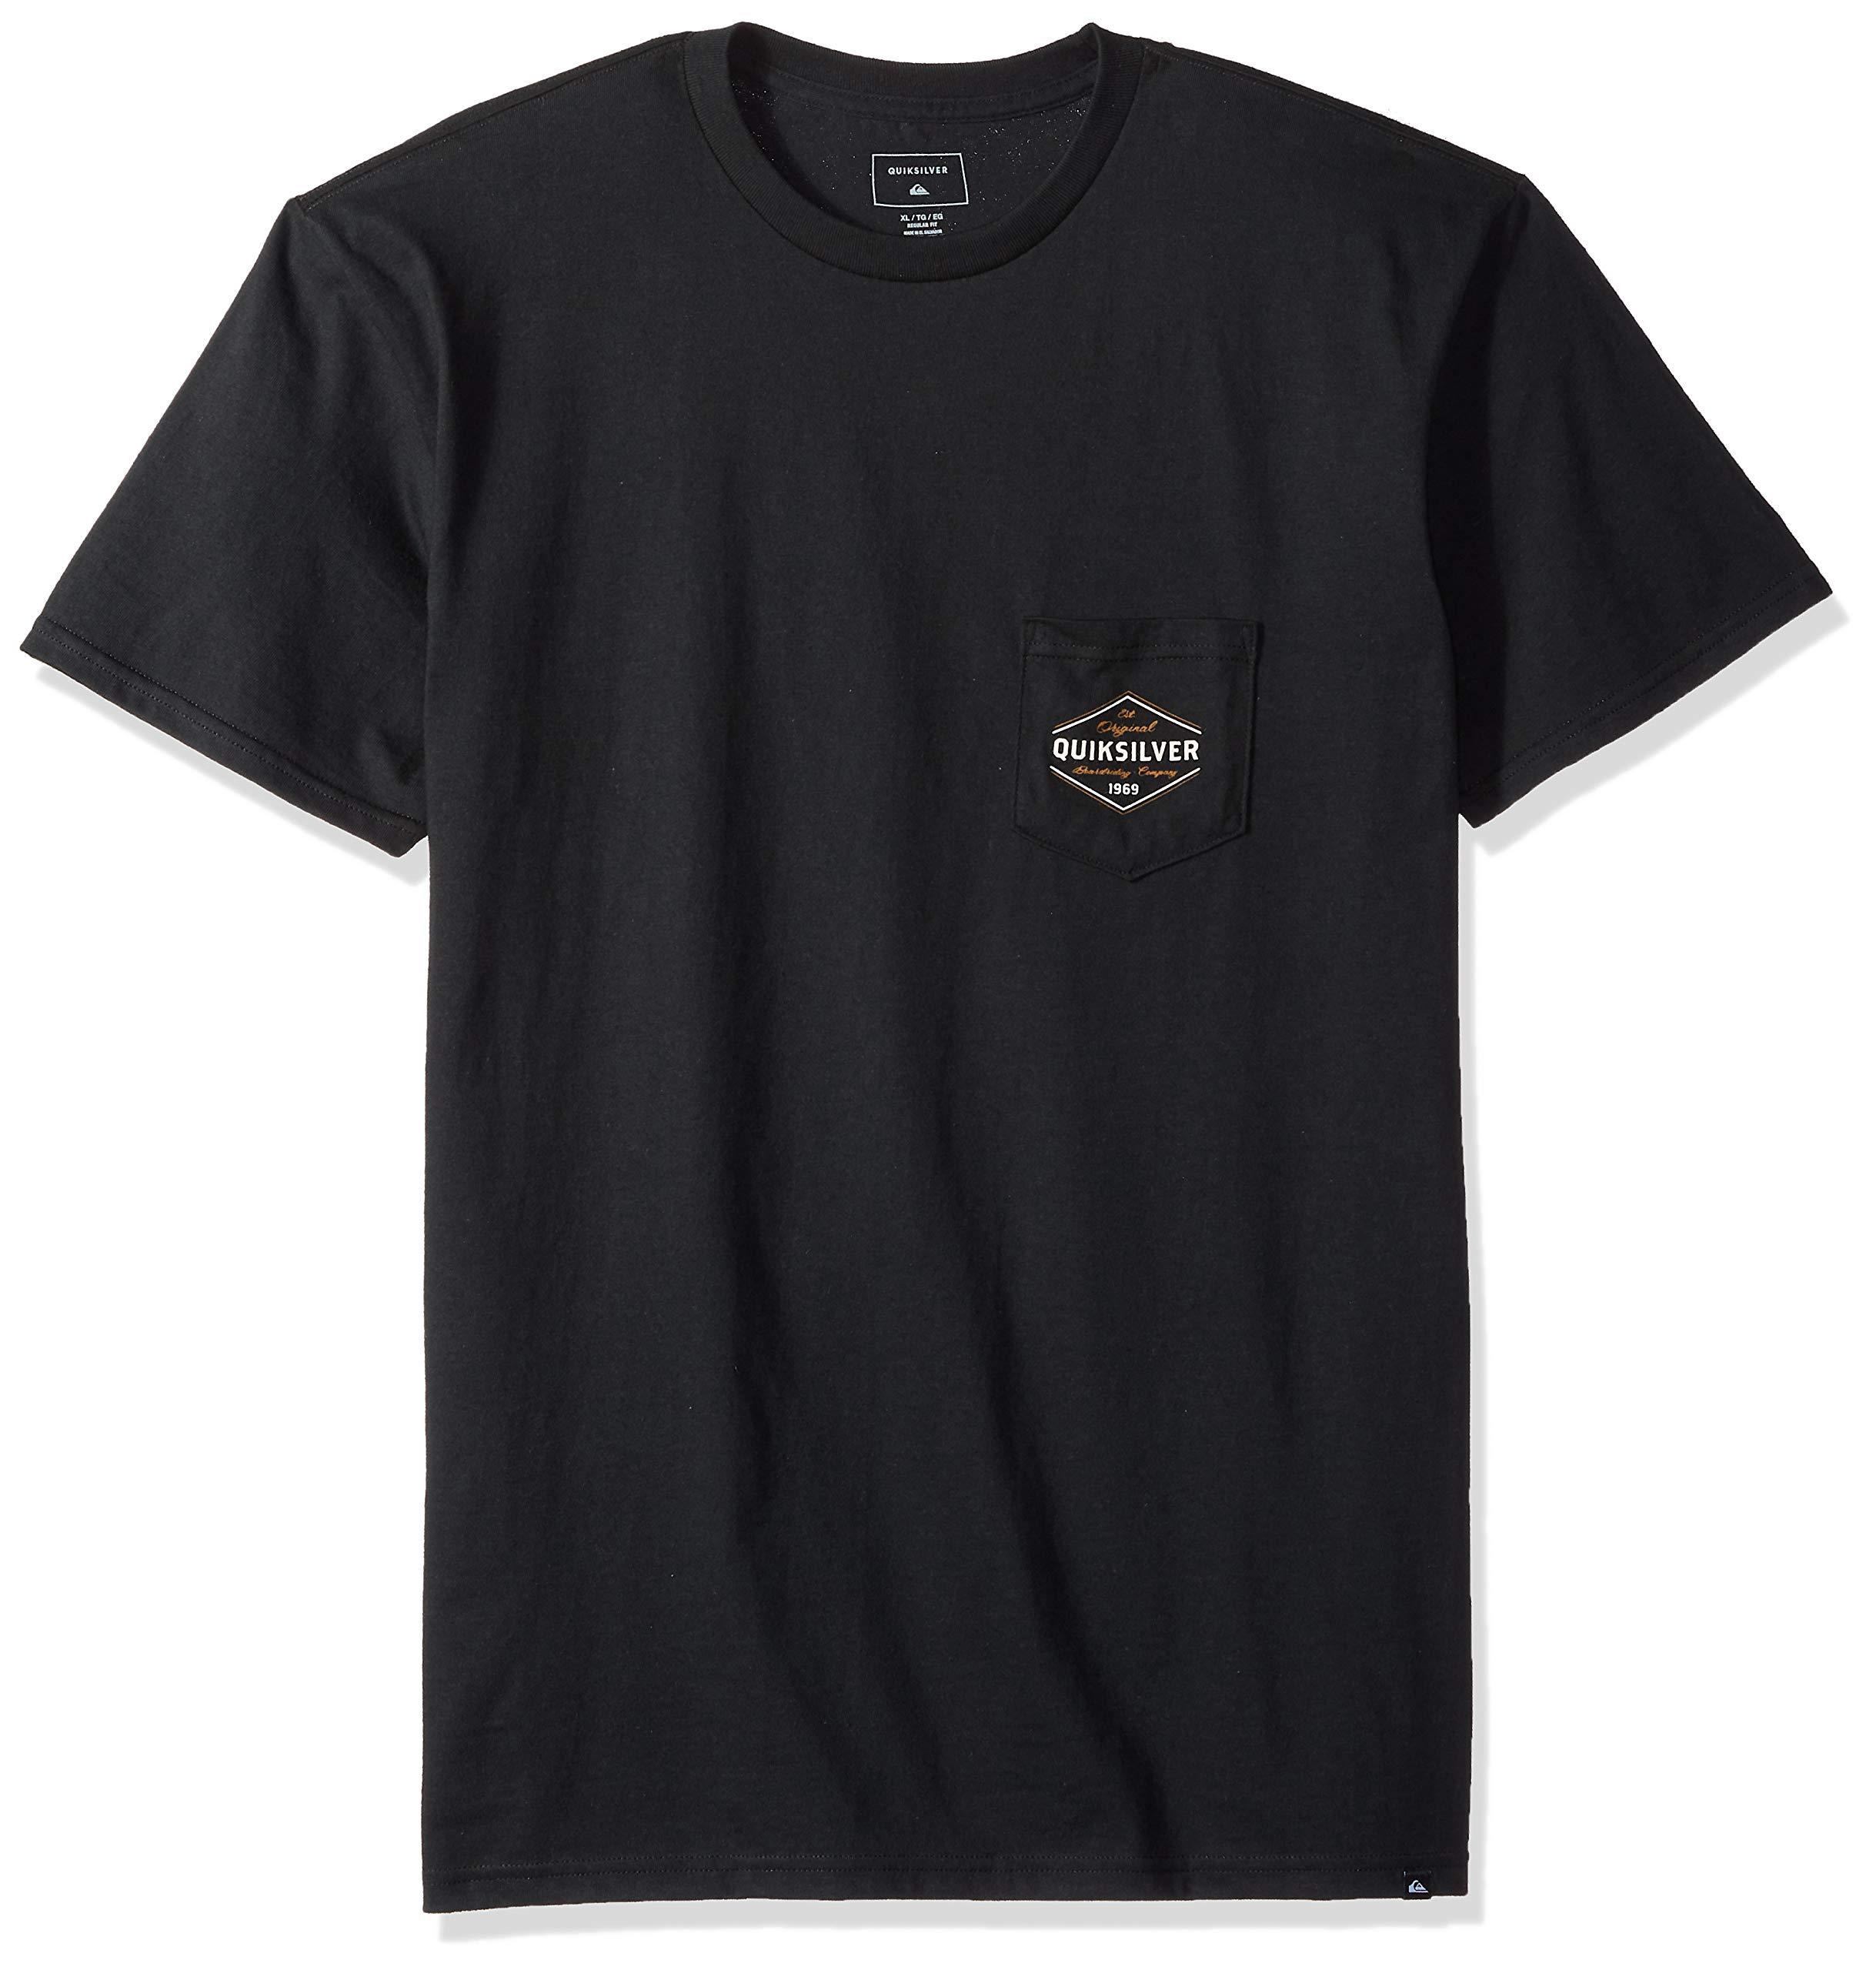 Quiksilver Men's Nowhere North Tee Shirt, Black, XL